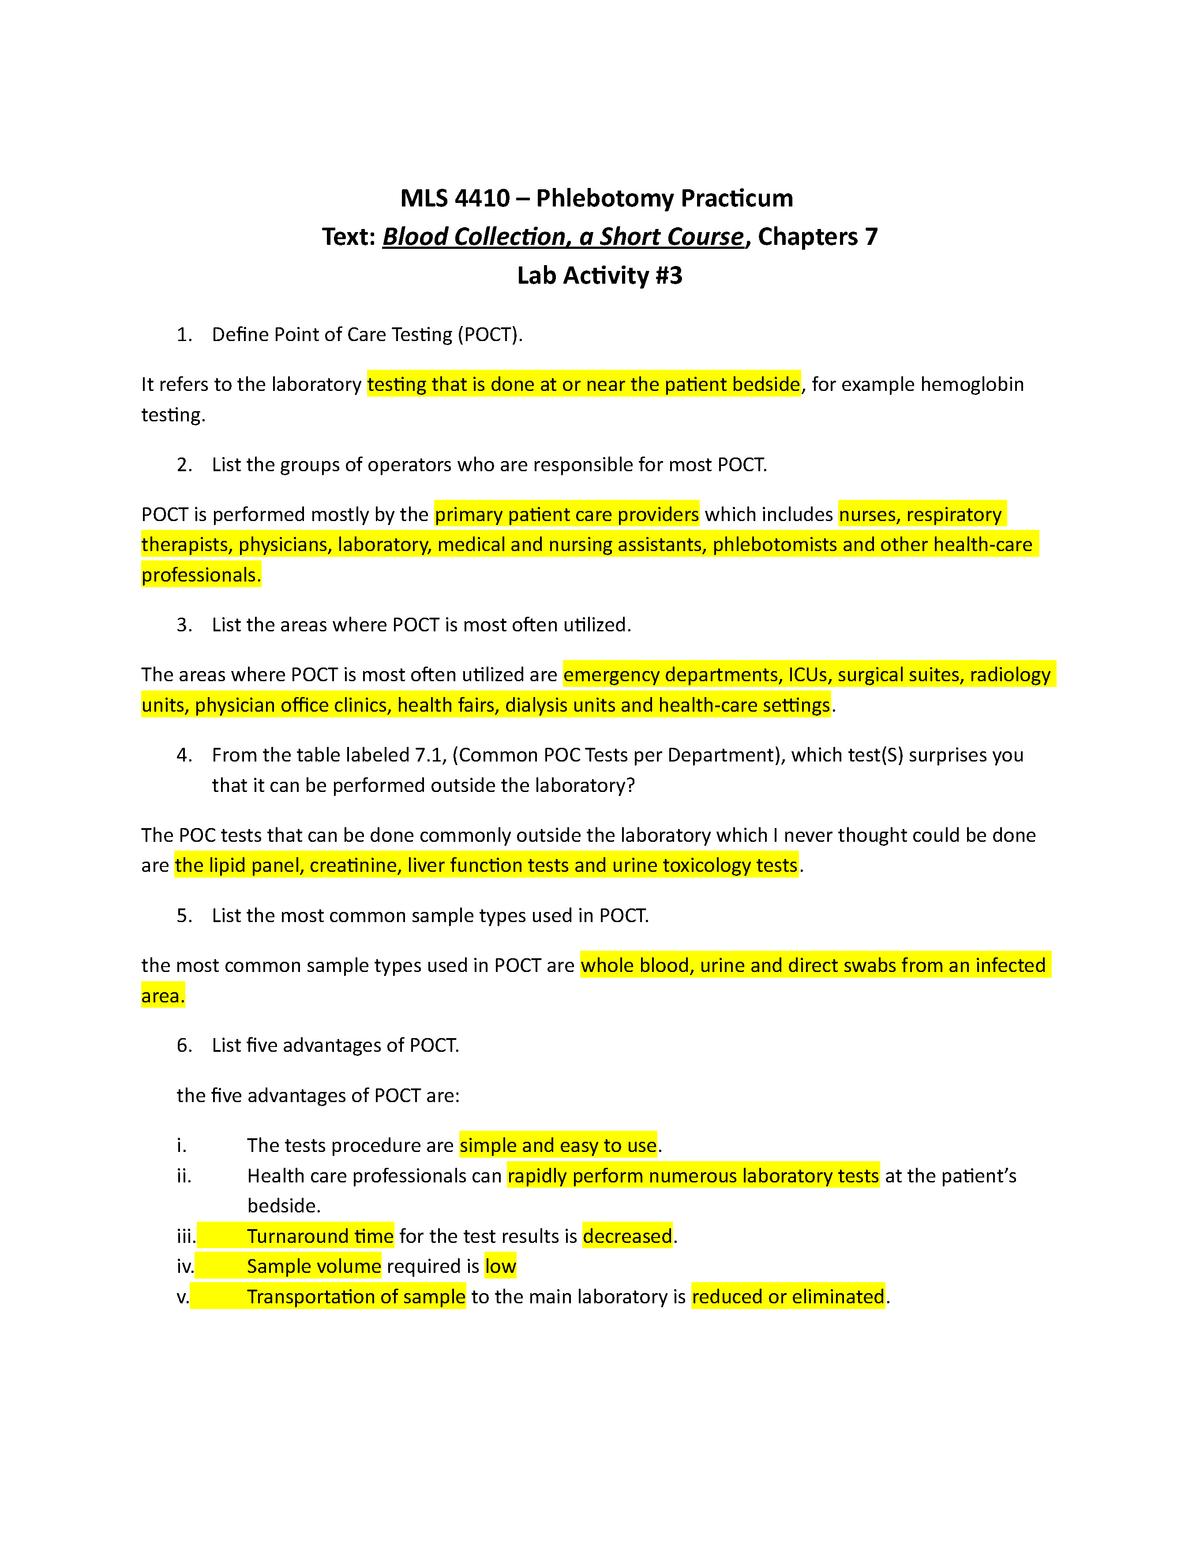 Phleb Lab3 - lab activity - MLS 4410: Phlebotomy Practicum